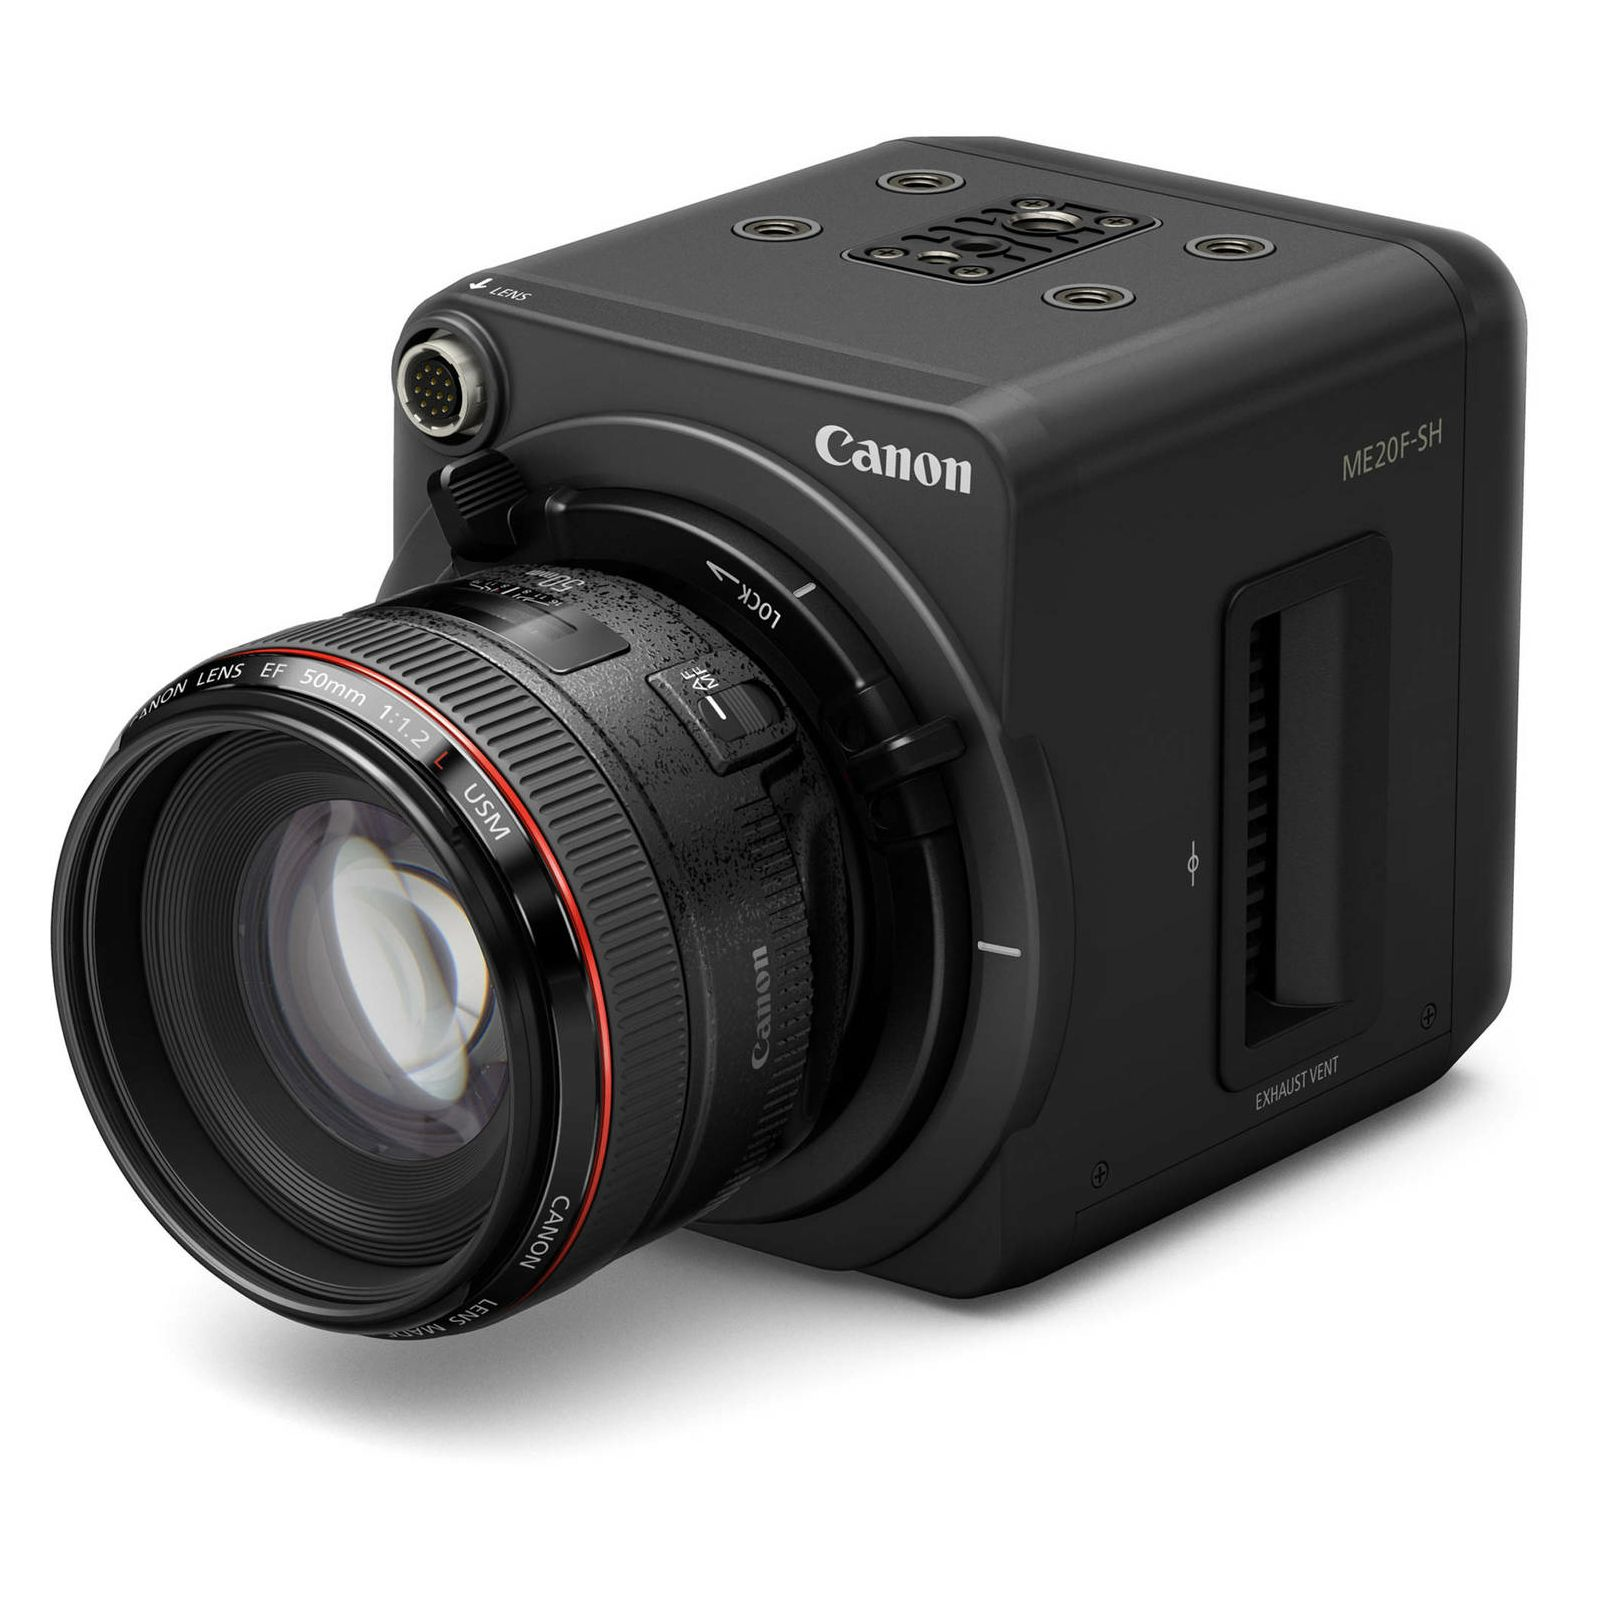 Canon ME20F-SH Super 35mm digitalna videokamera Full Frame Multi ...